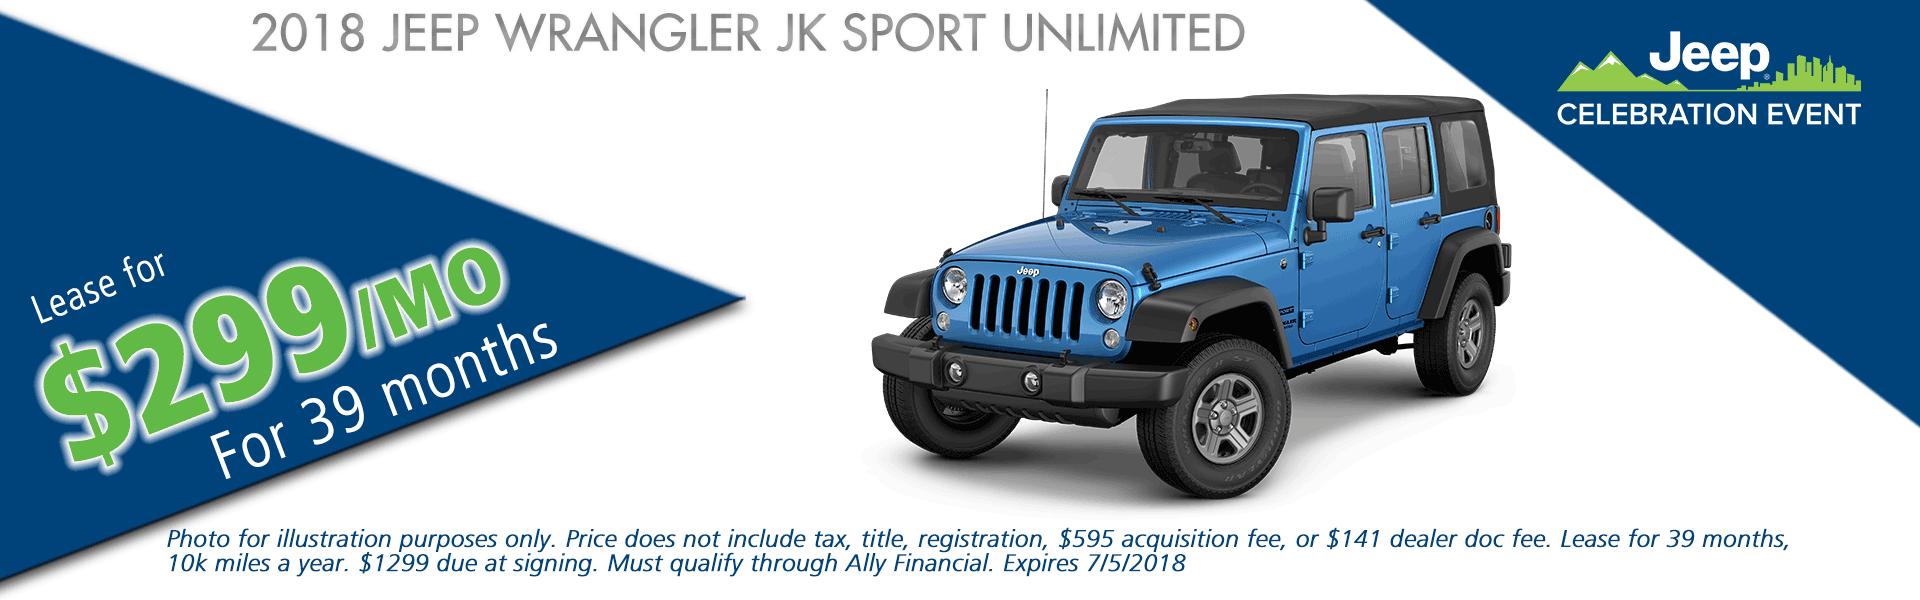 NEW 2018 JEEP WRANGLER JK UNLIMITED SPORT 4X4 carright chrysler jeep dodge ram moon township pennsylvania pittsburgh